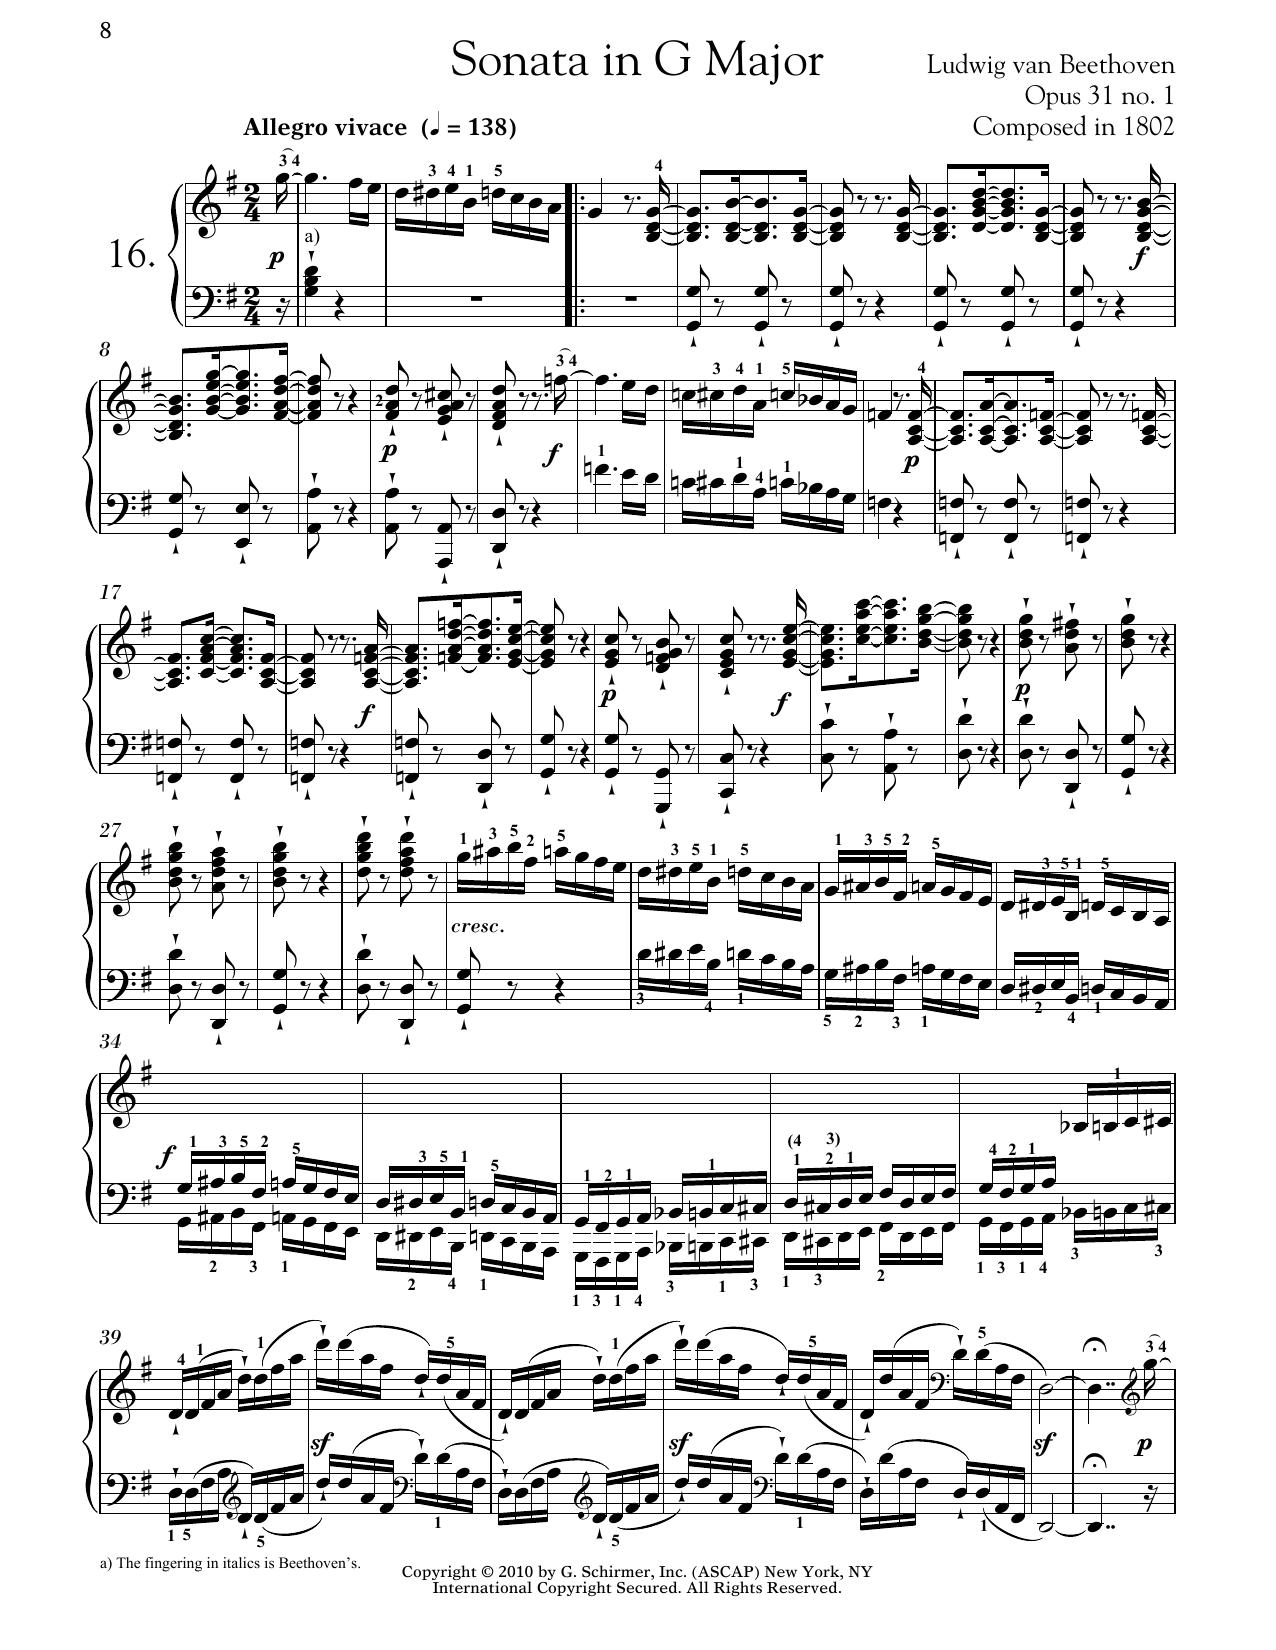 Piano Sonata No. 16 In G Major, Op. 31, No. 1 Sheet Music